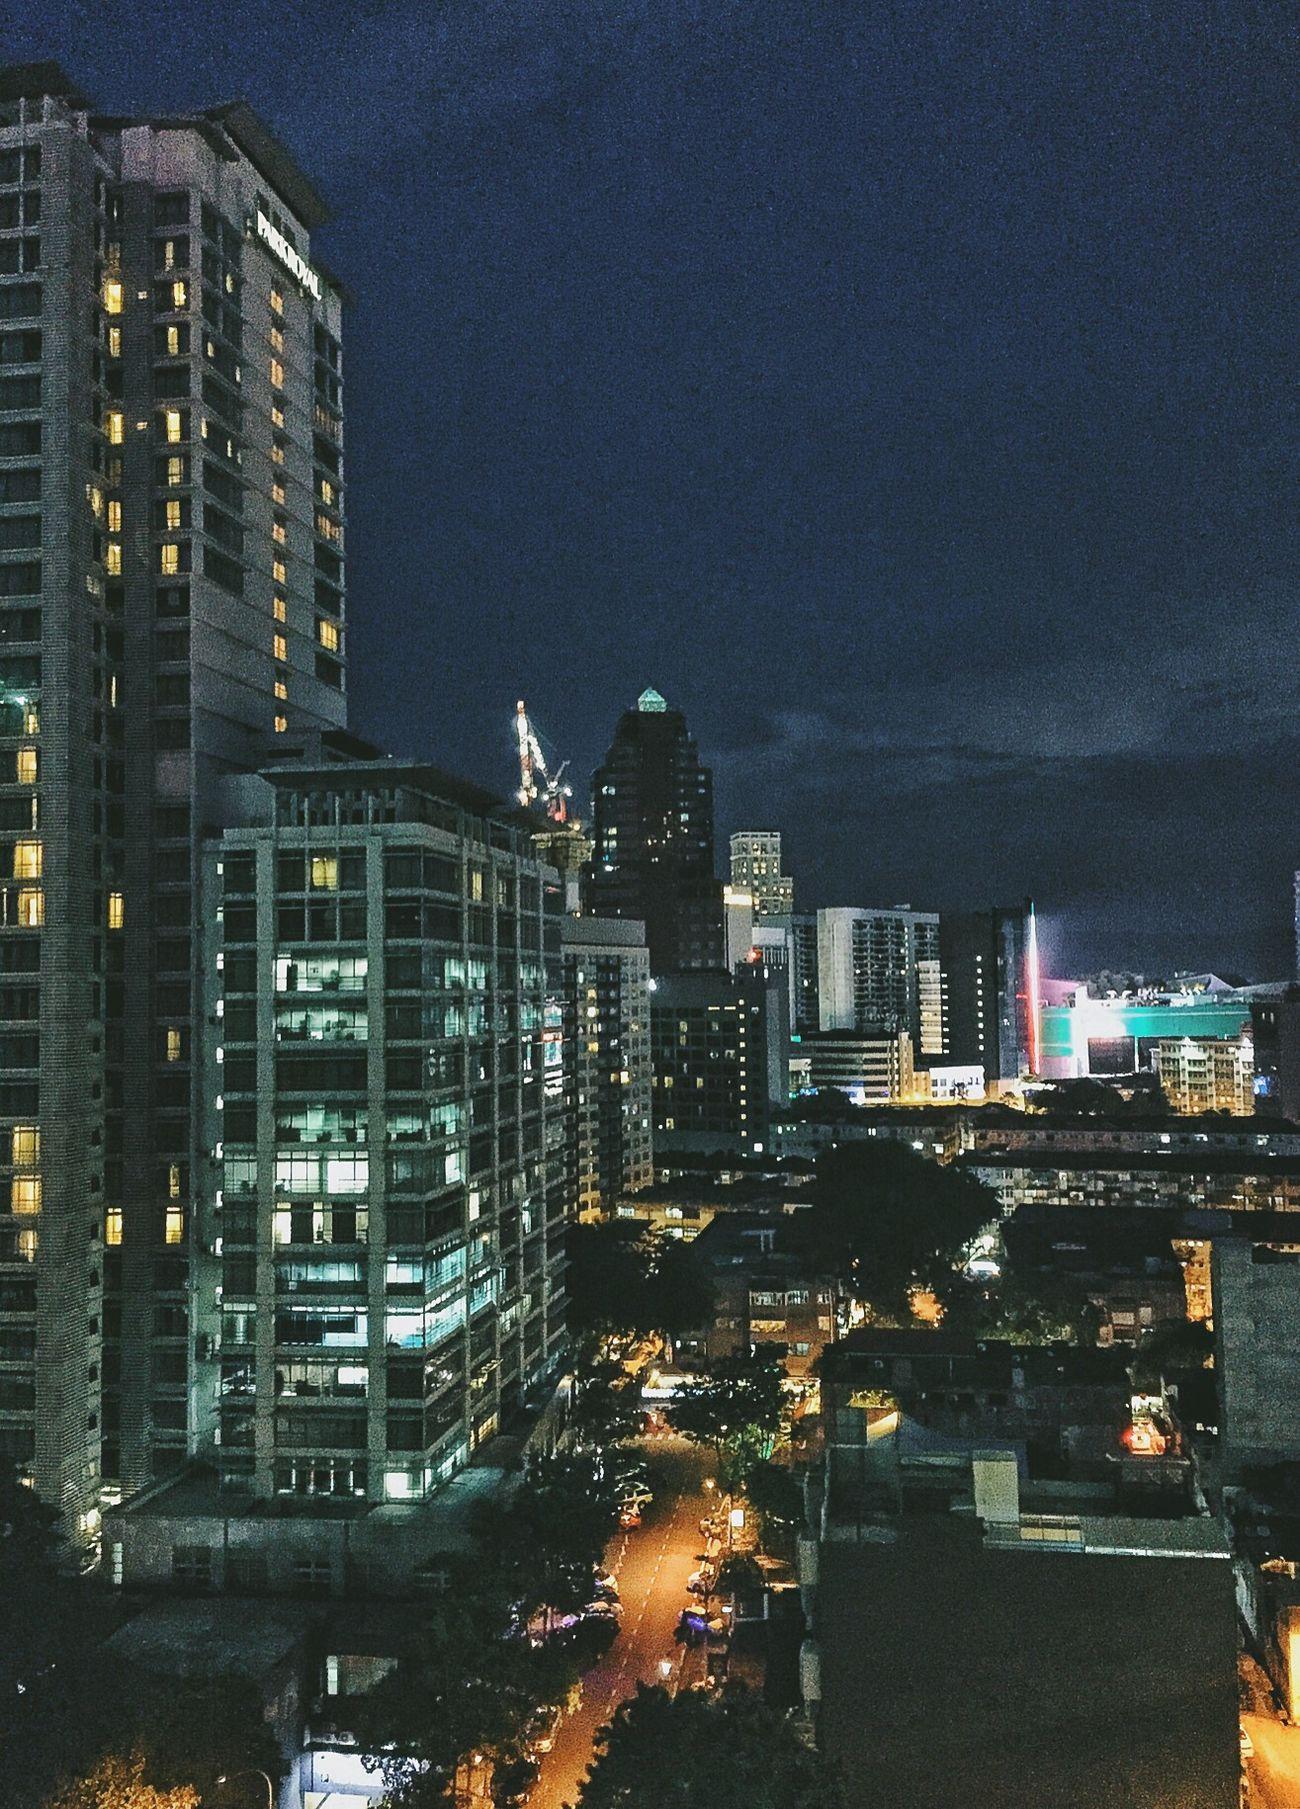 Garden city of lights Klcity Kuala Lumpur Nightphotography